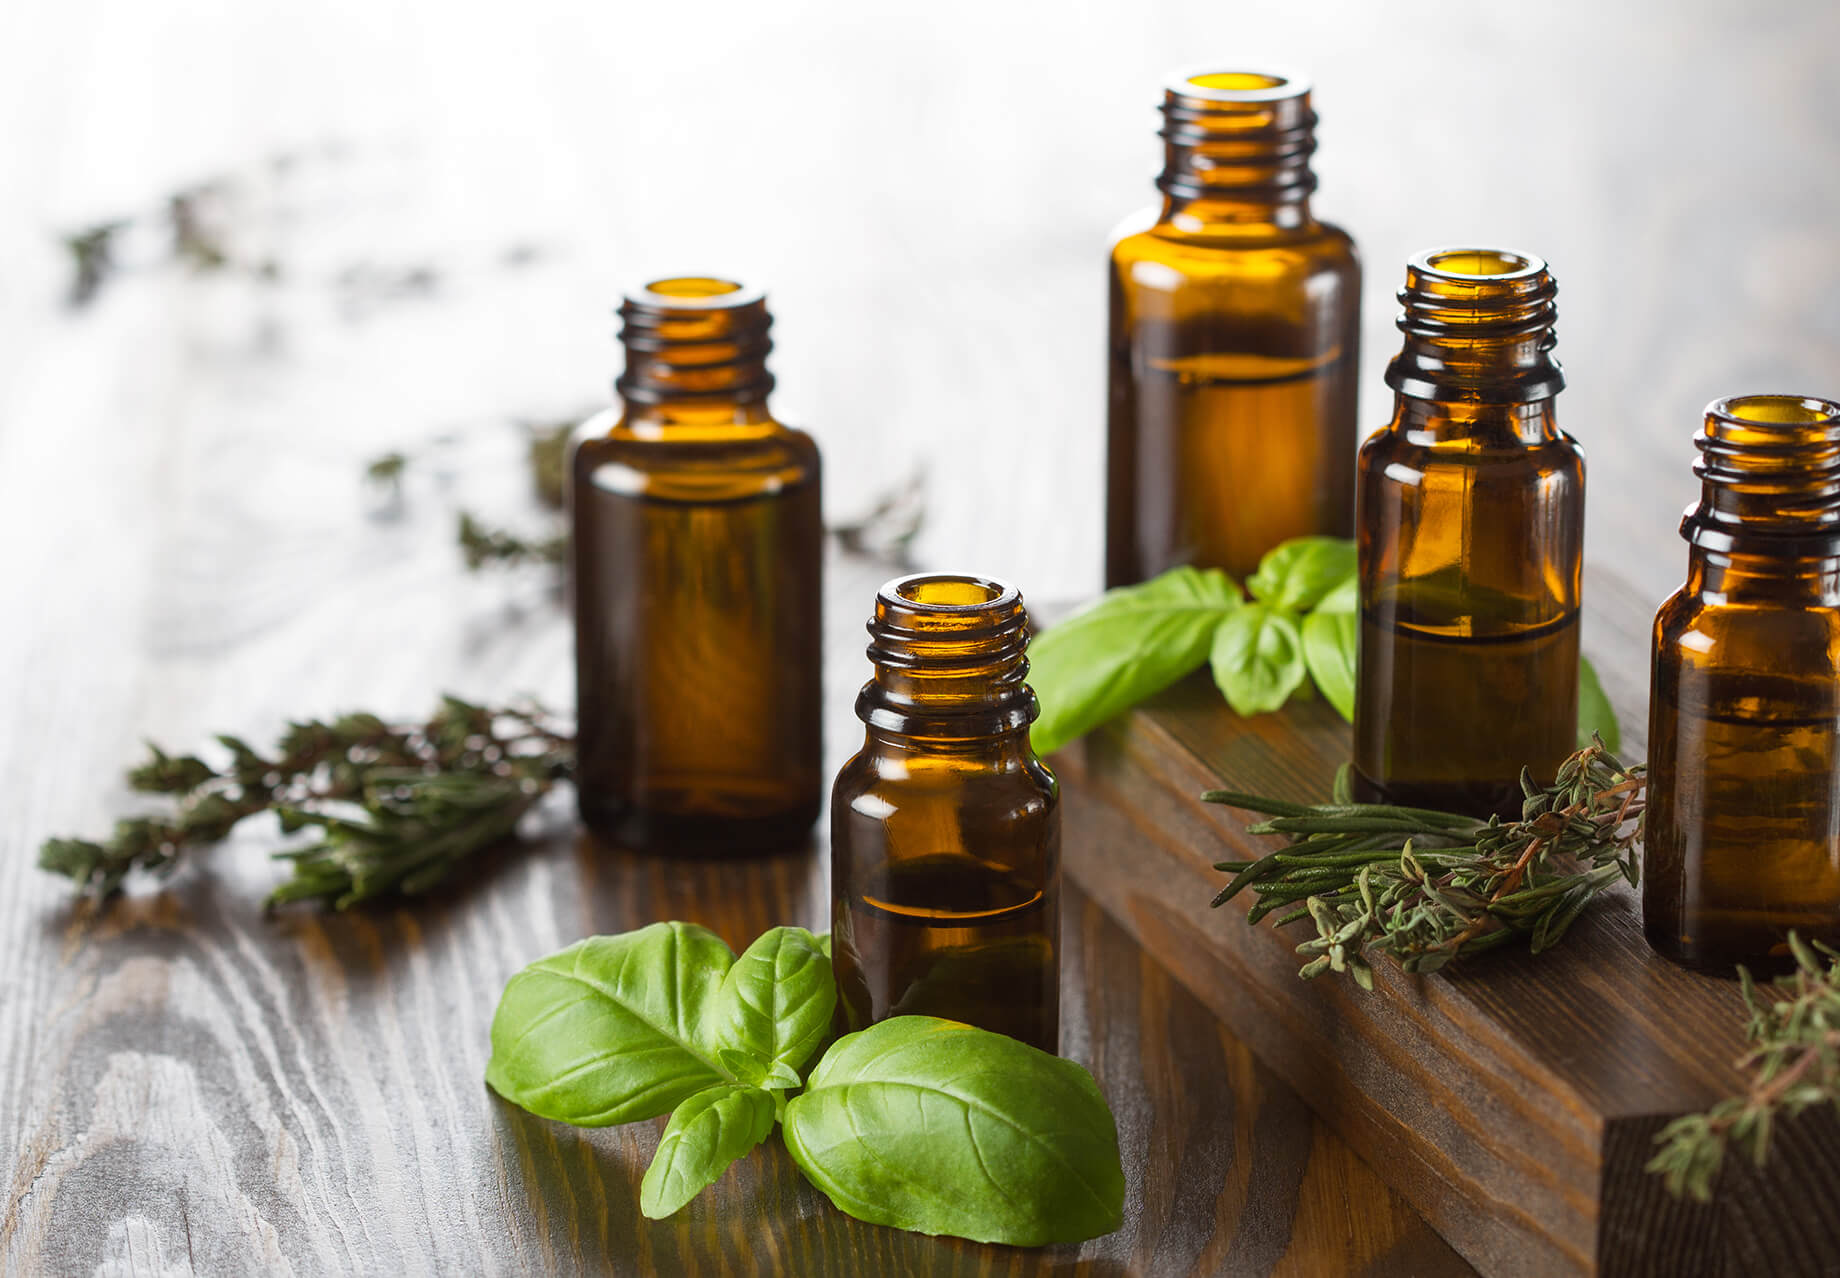 vyber esencialneho oleja obrazok